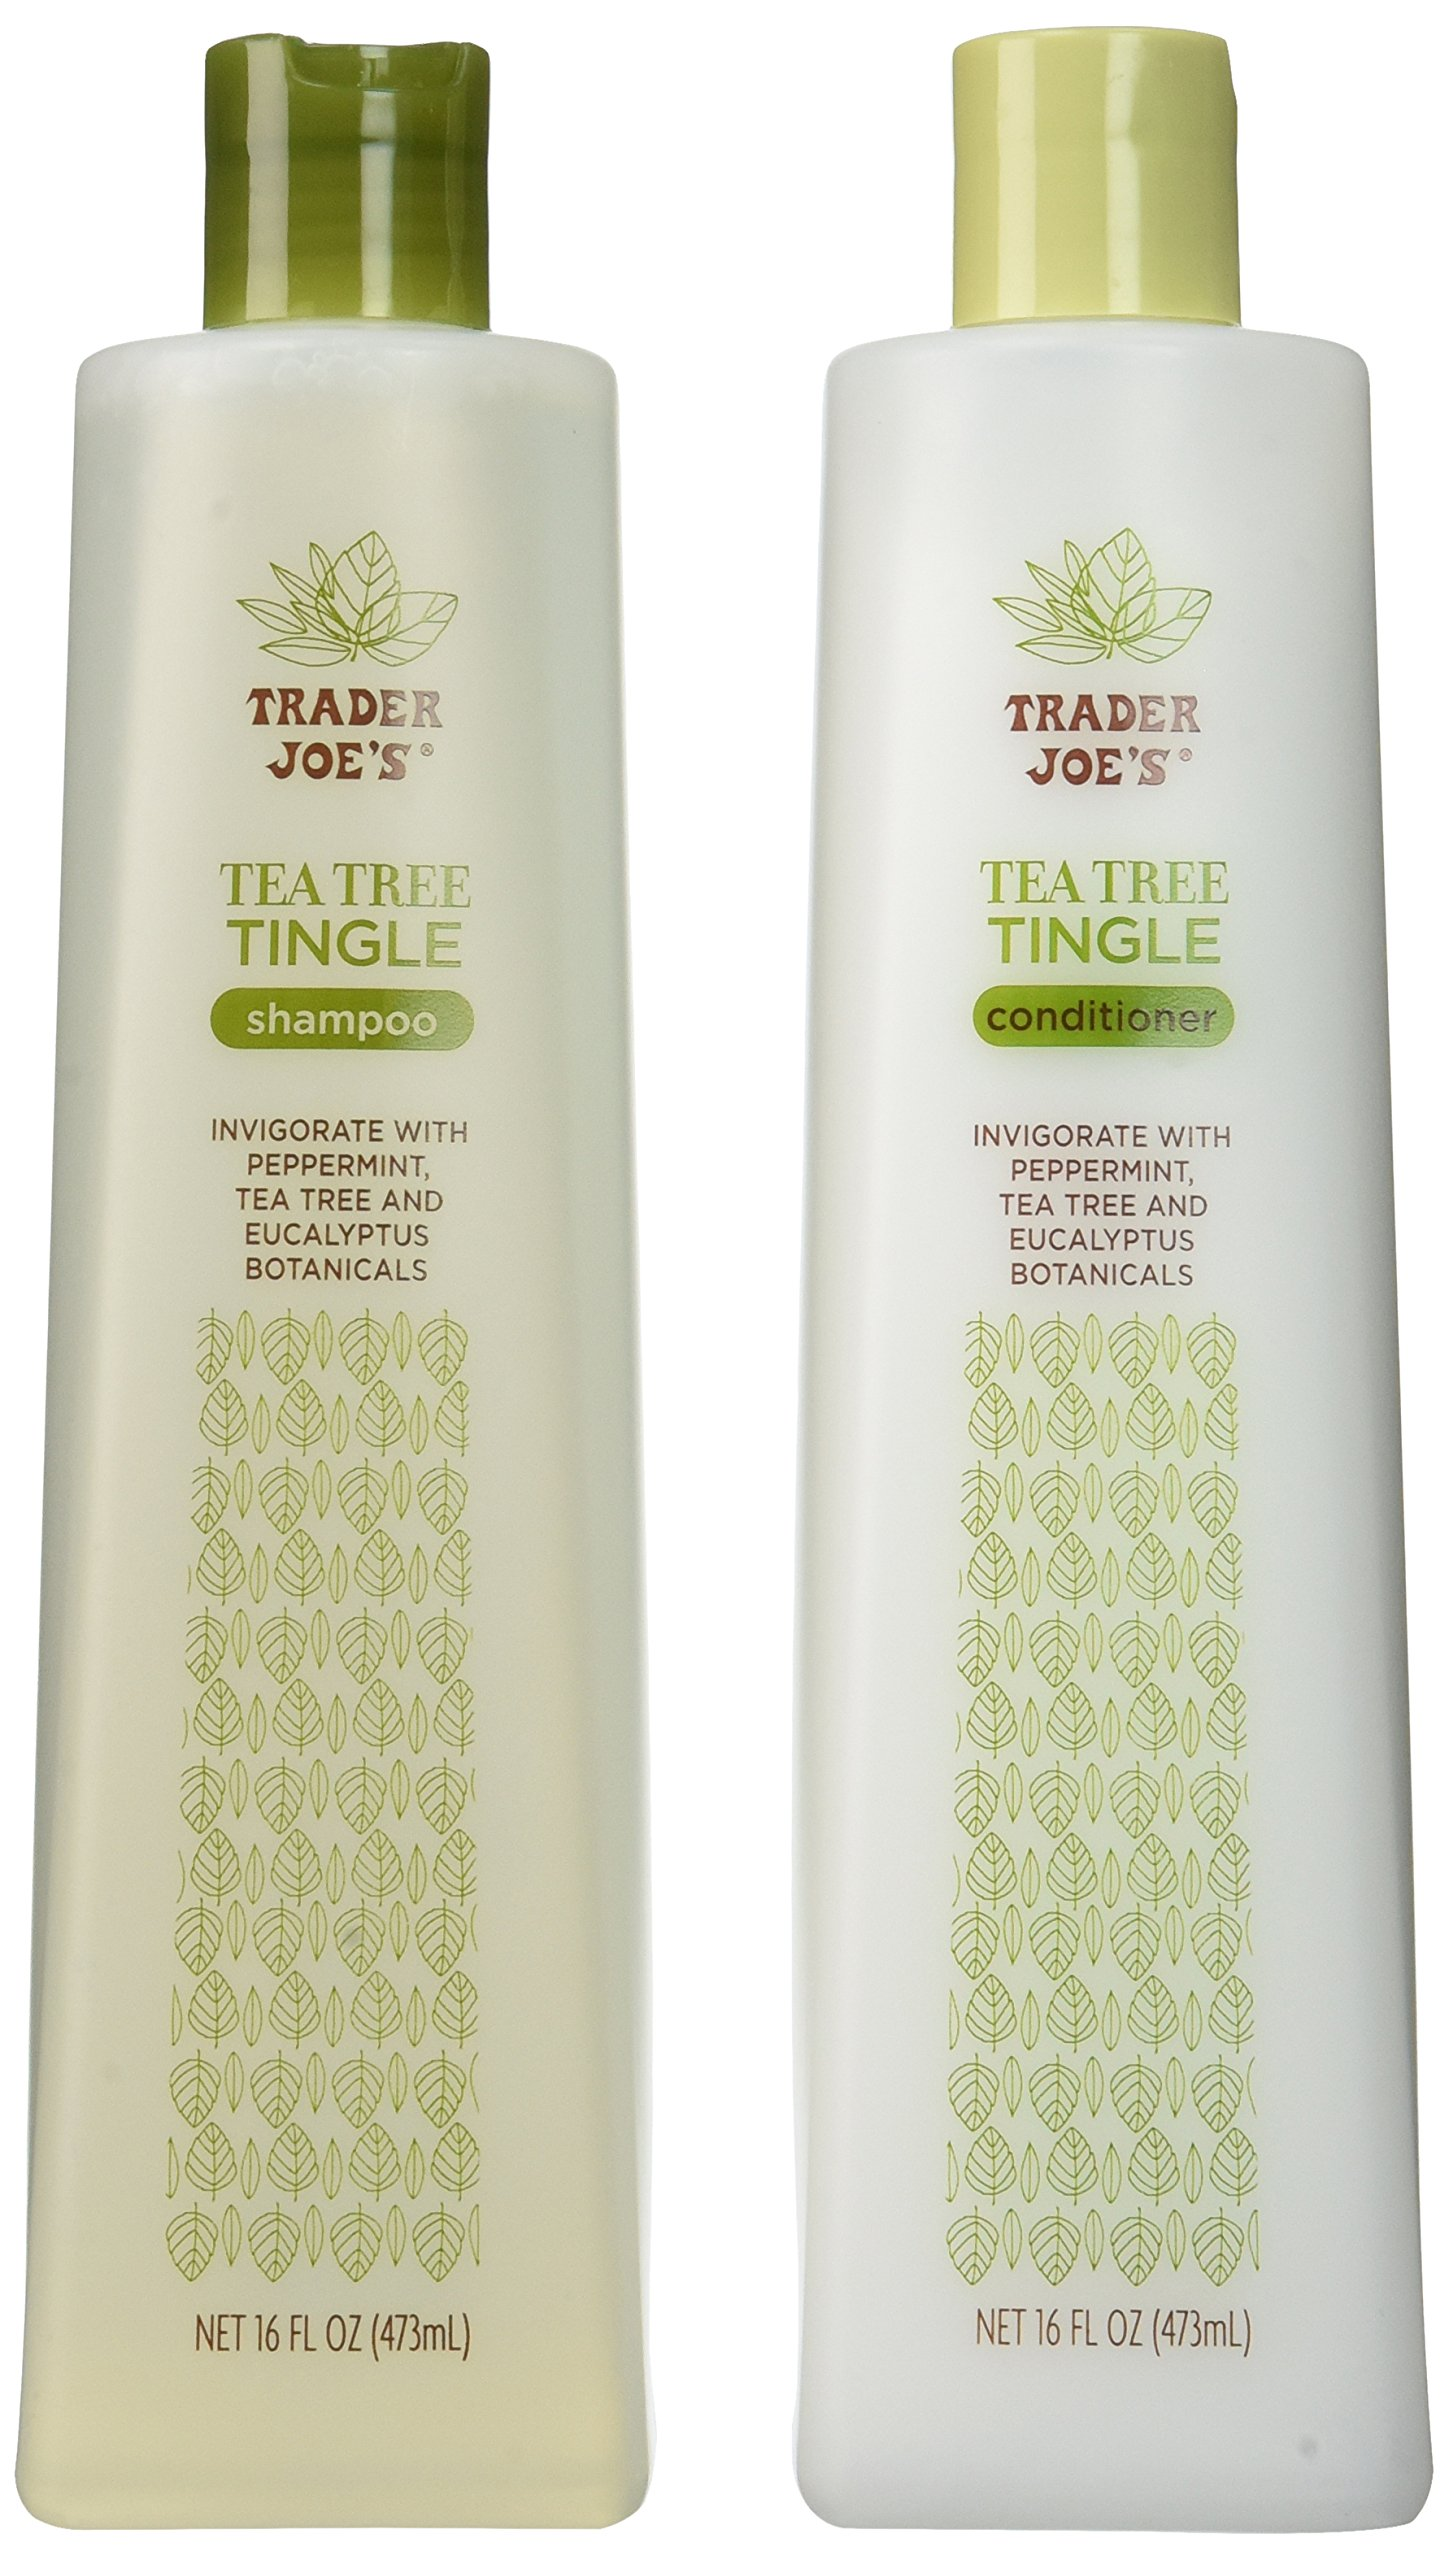 Trader Joe's Tea Tree Tingle Shampoo & Conditioner, 16 oz. by Thinkpichaidai